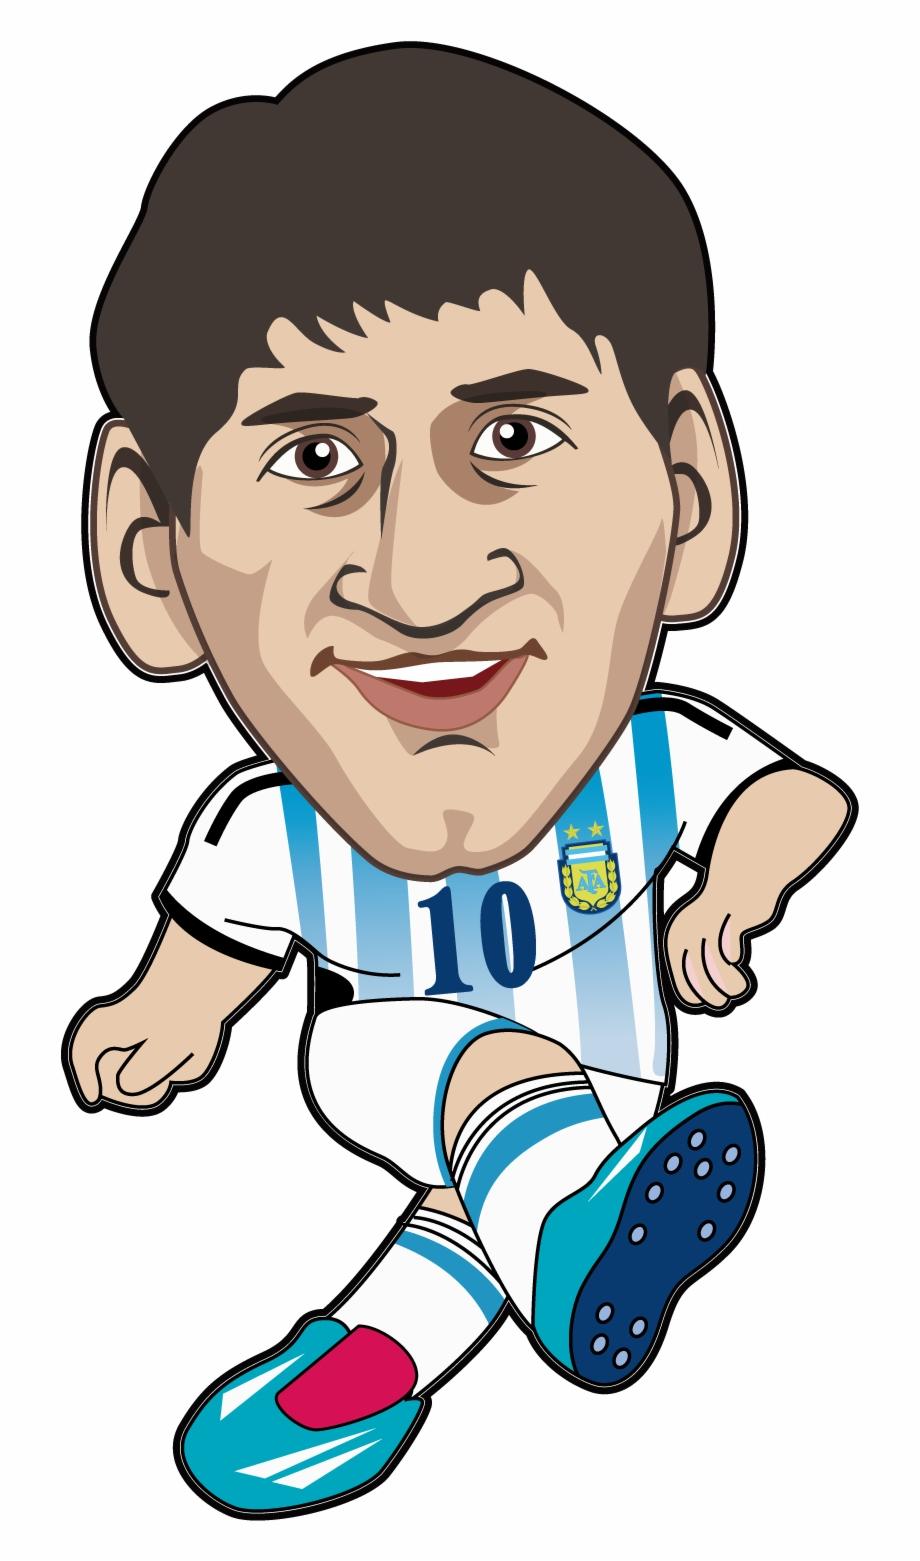 Drawing Messi Animation - Messi Animado Png | Transparent PNG ...